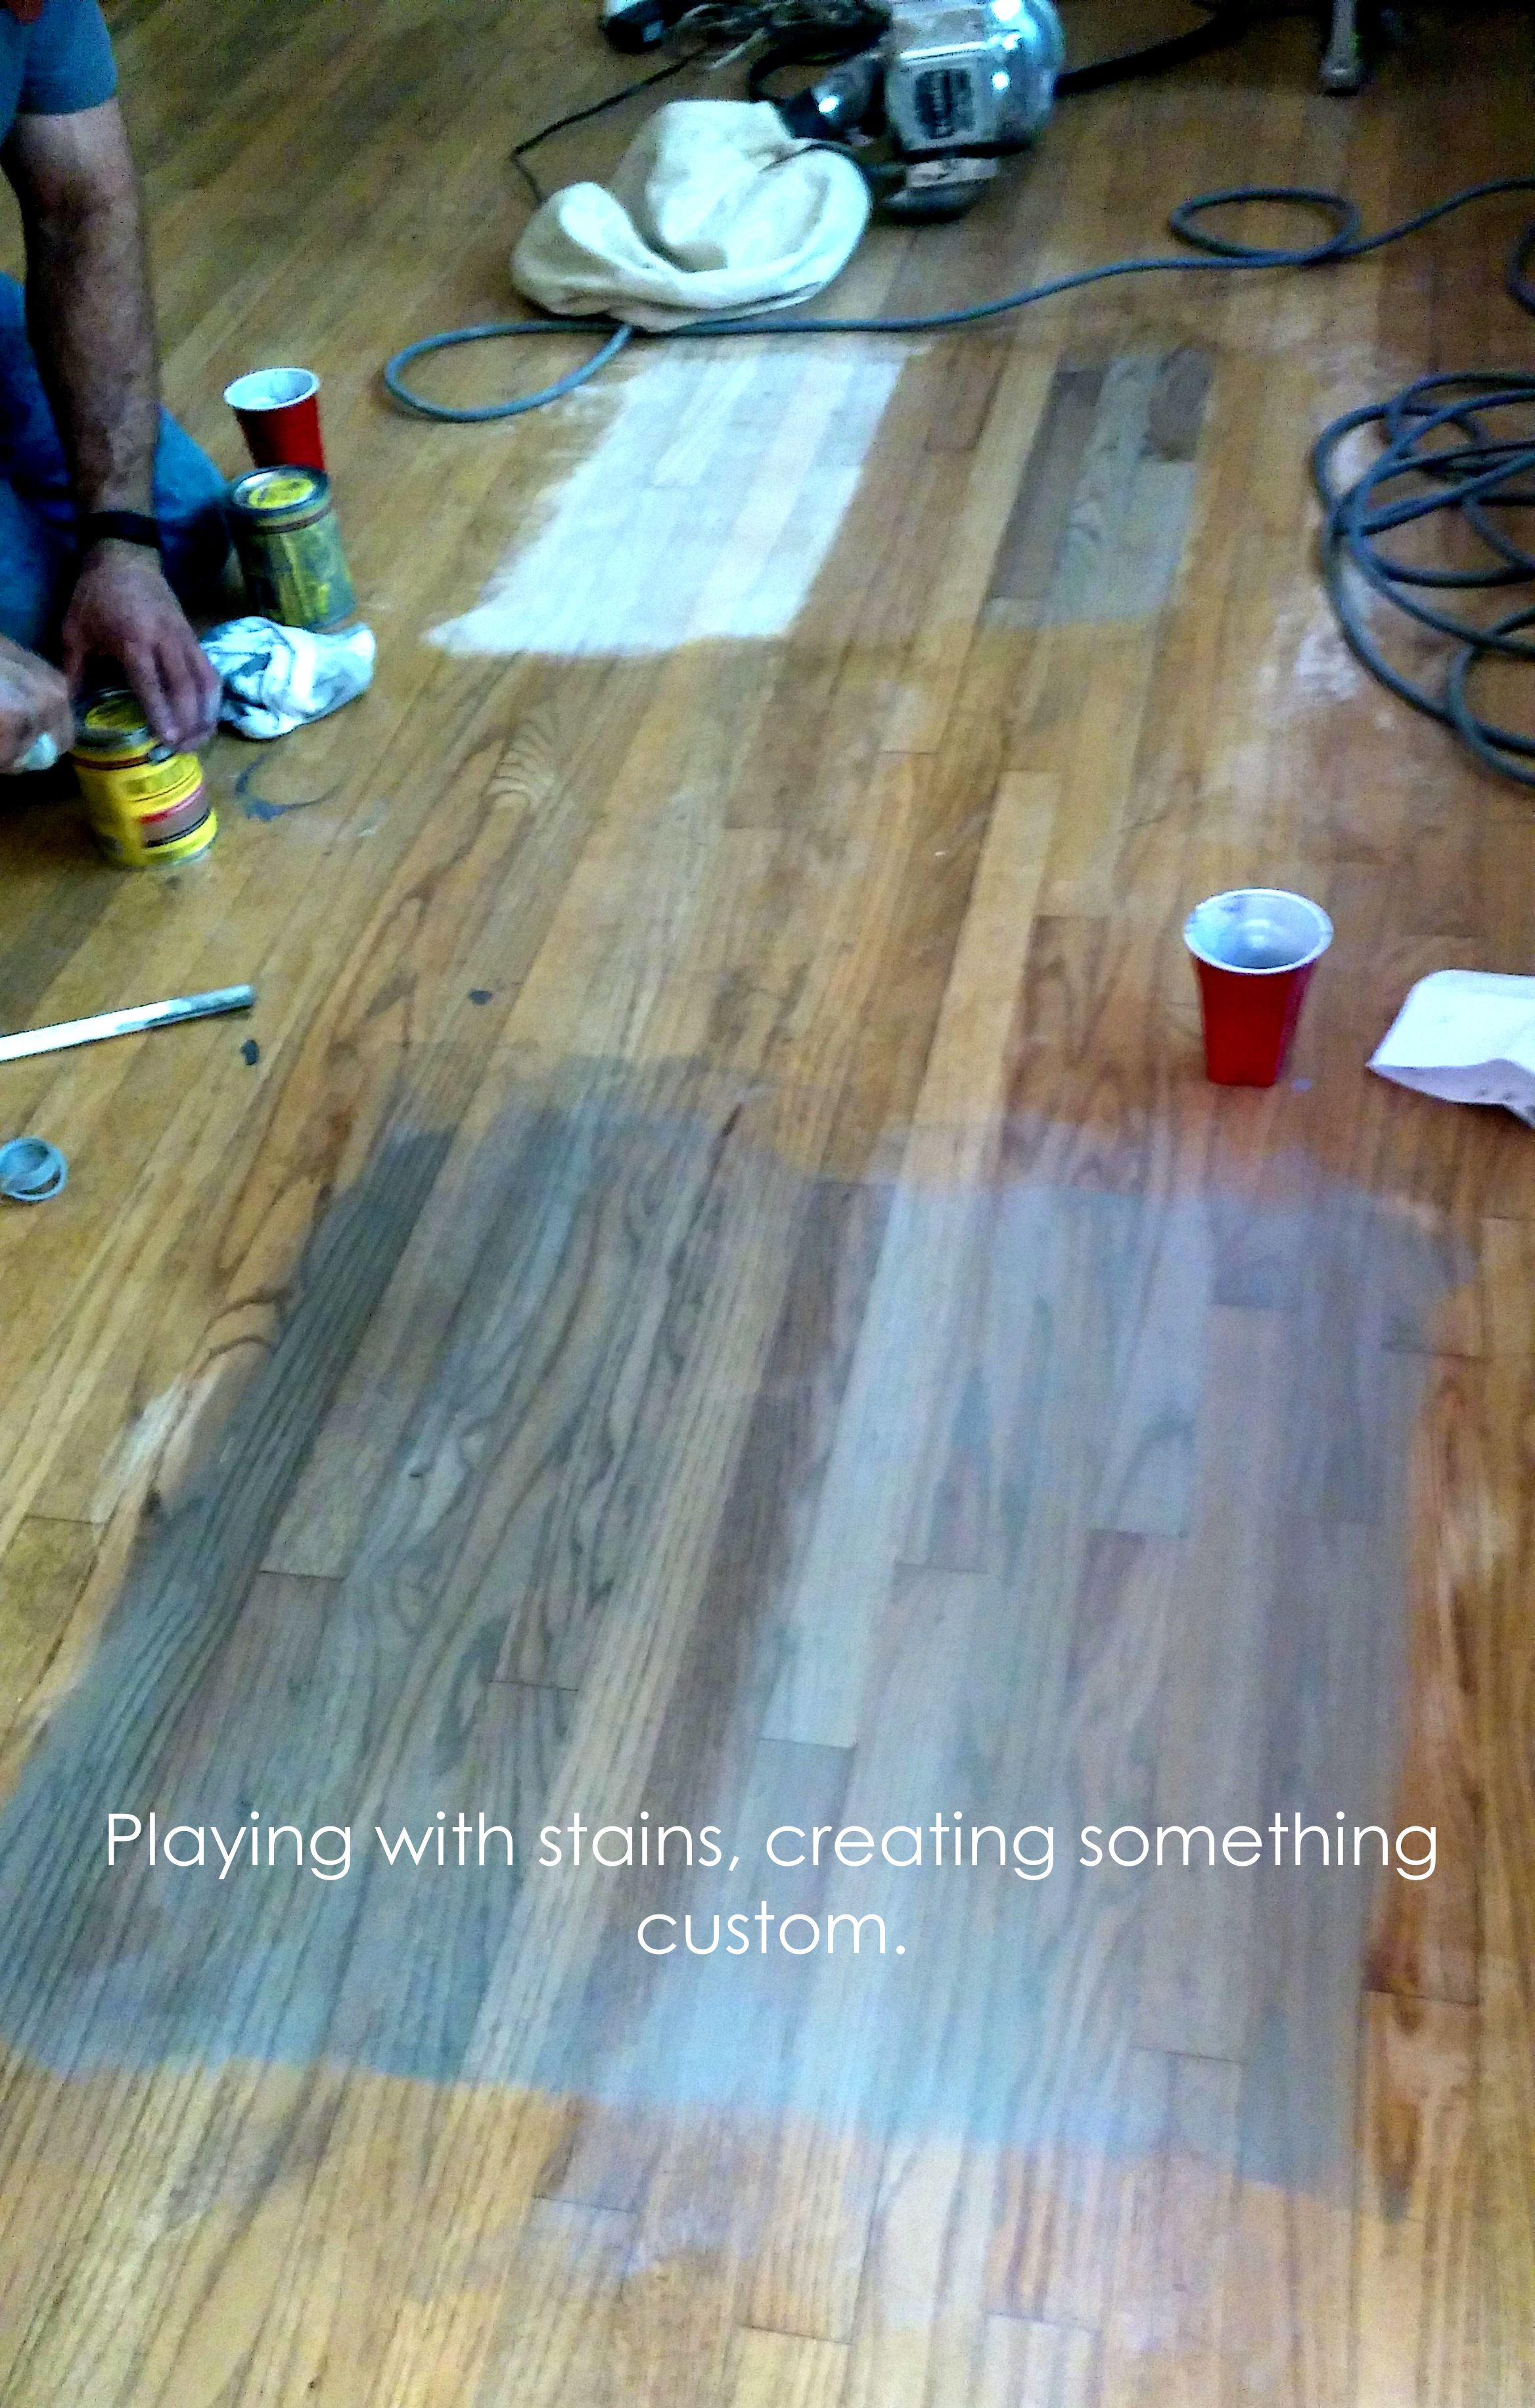 Creating Custom Stain